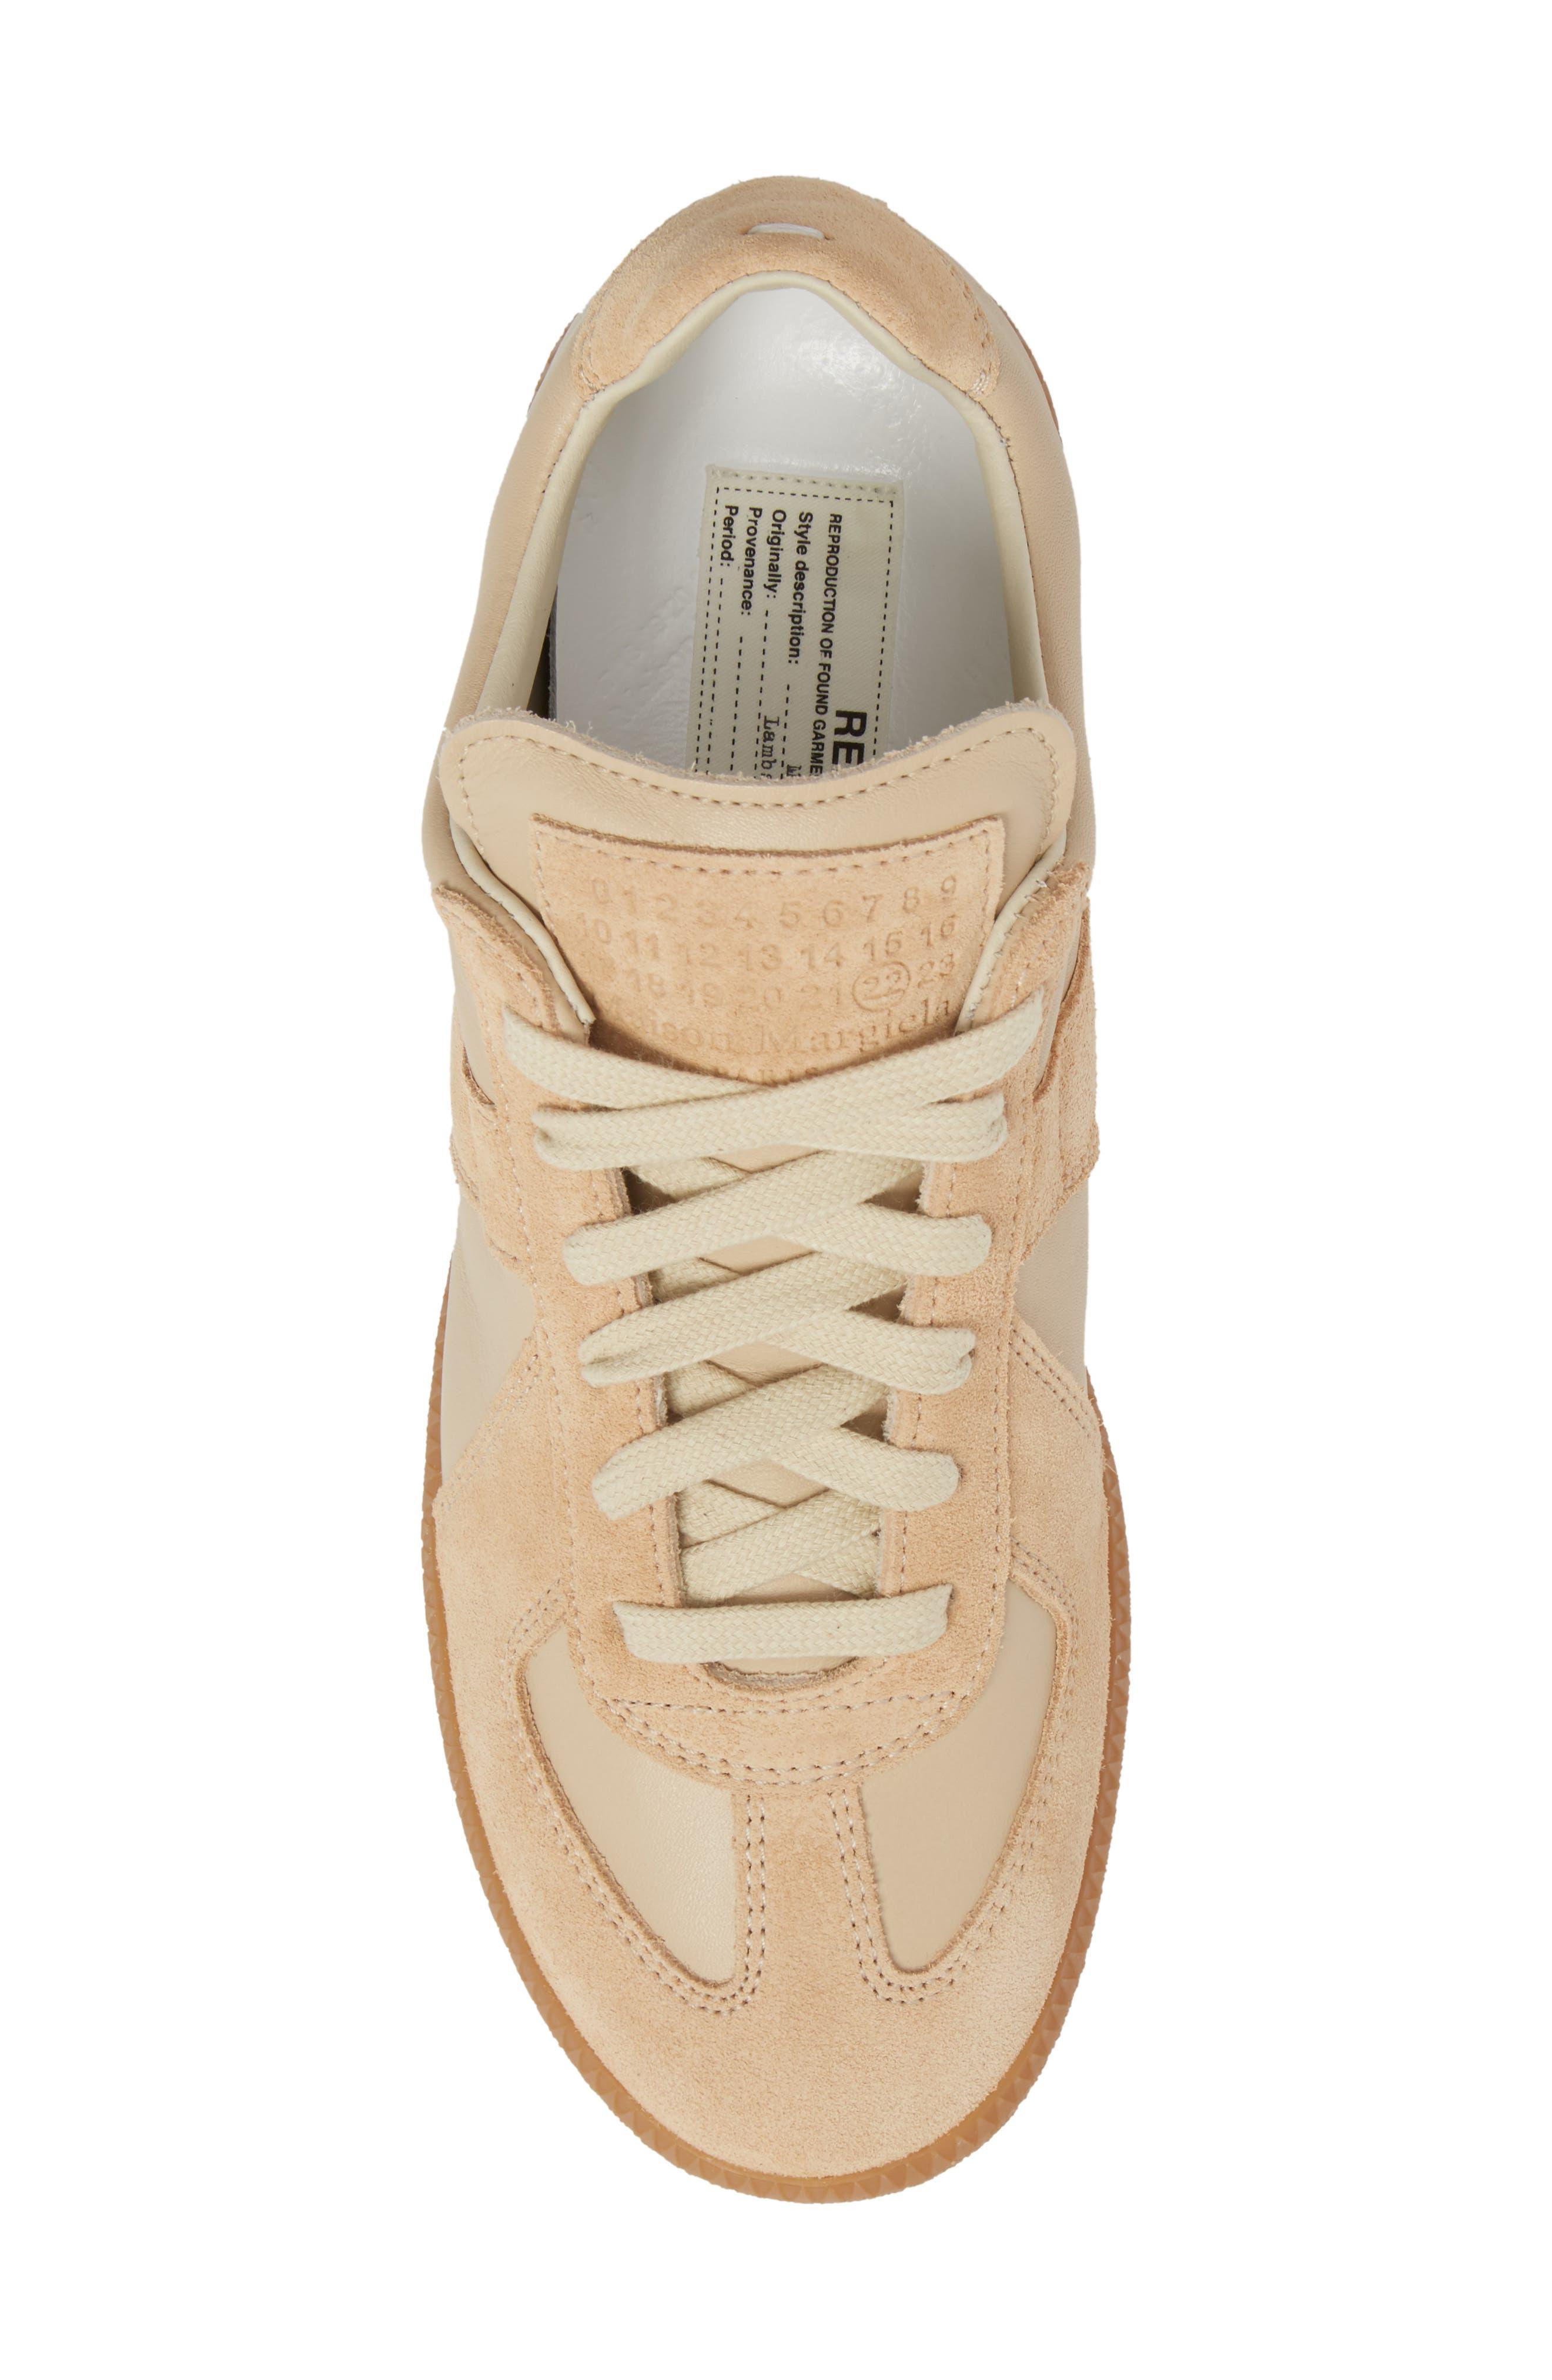 MAISON MARGIELA,                             Replica Sneaker,                             Alternate thumbnail 5, color,                             262